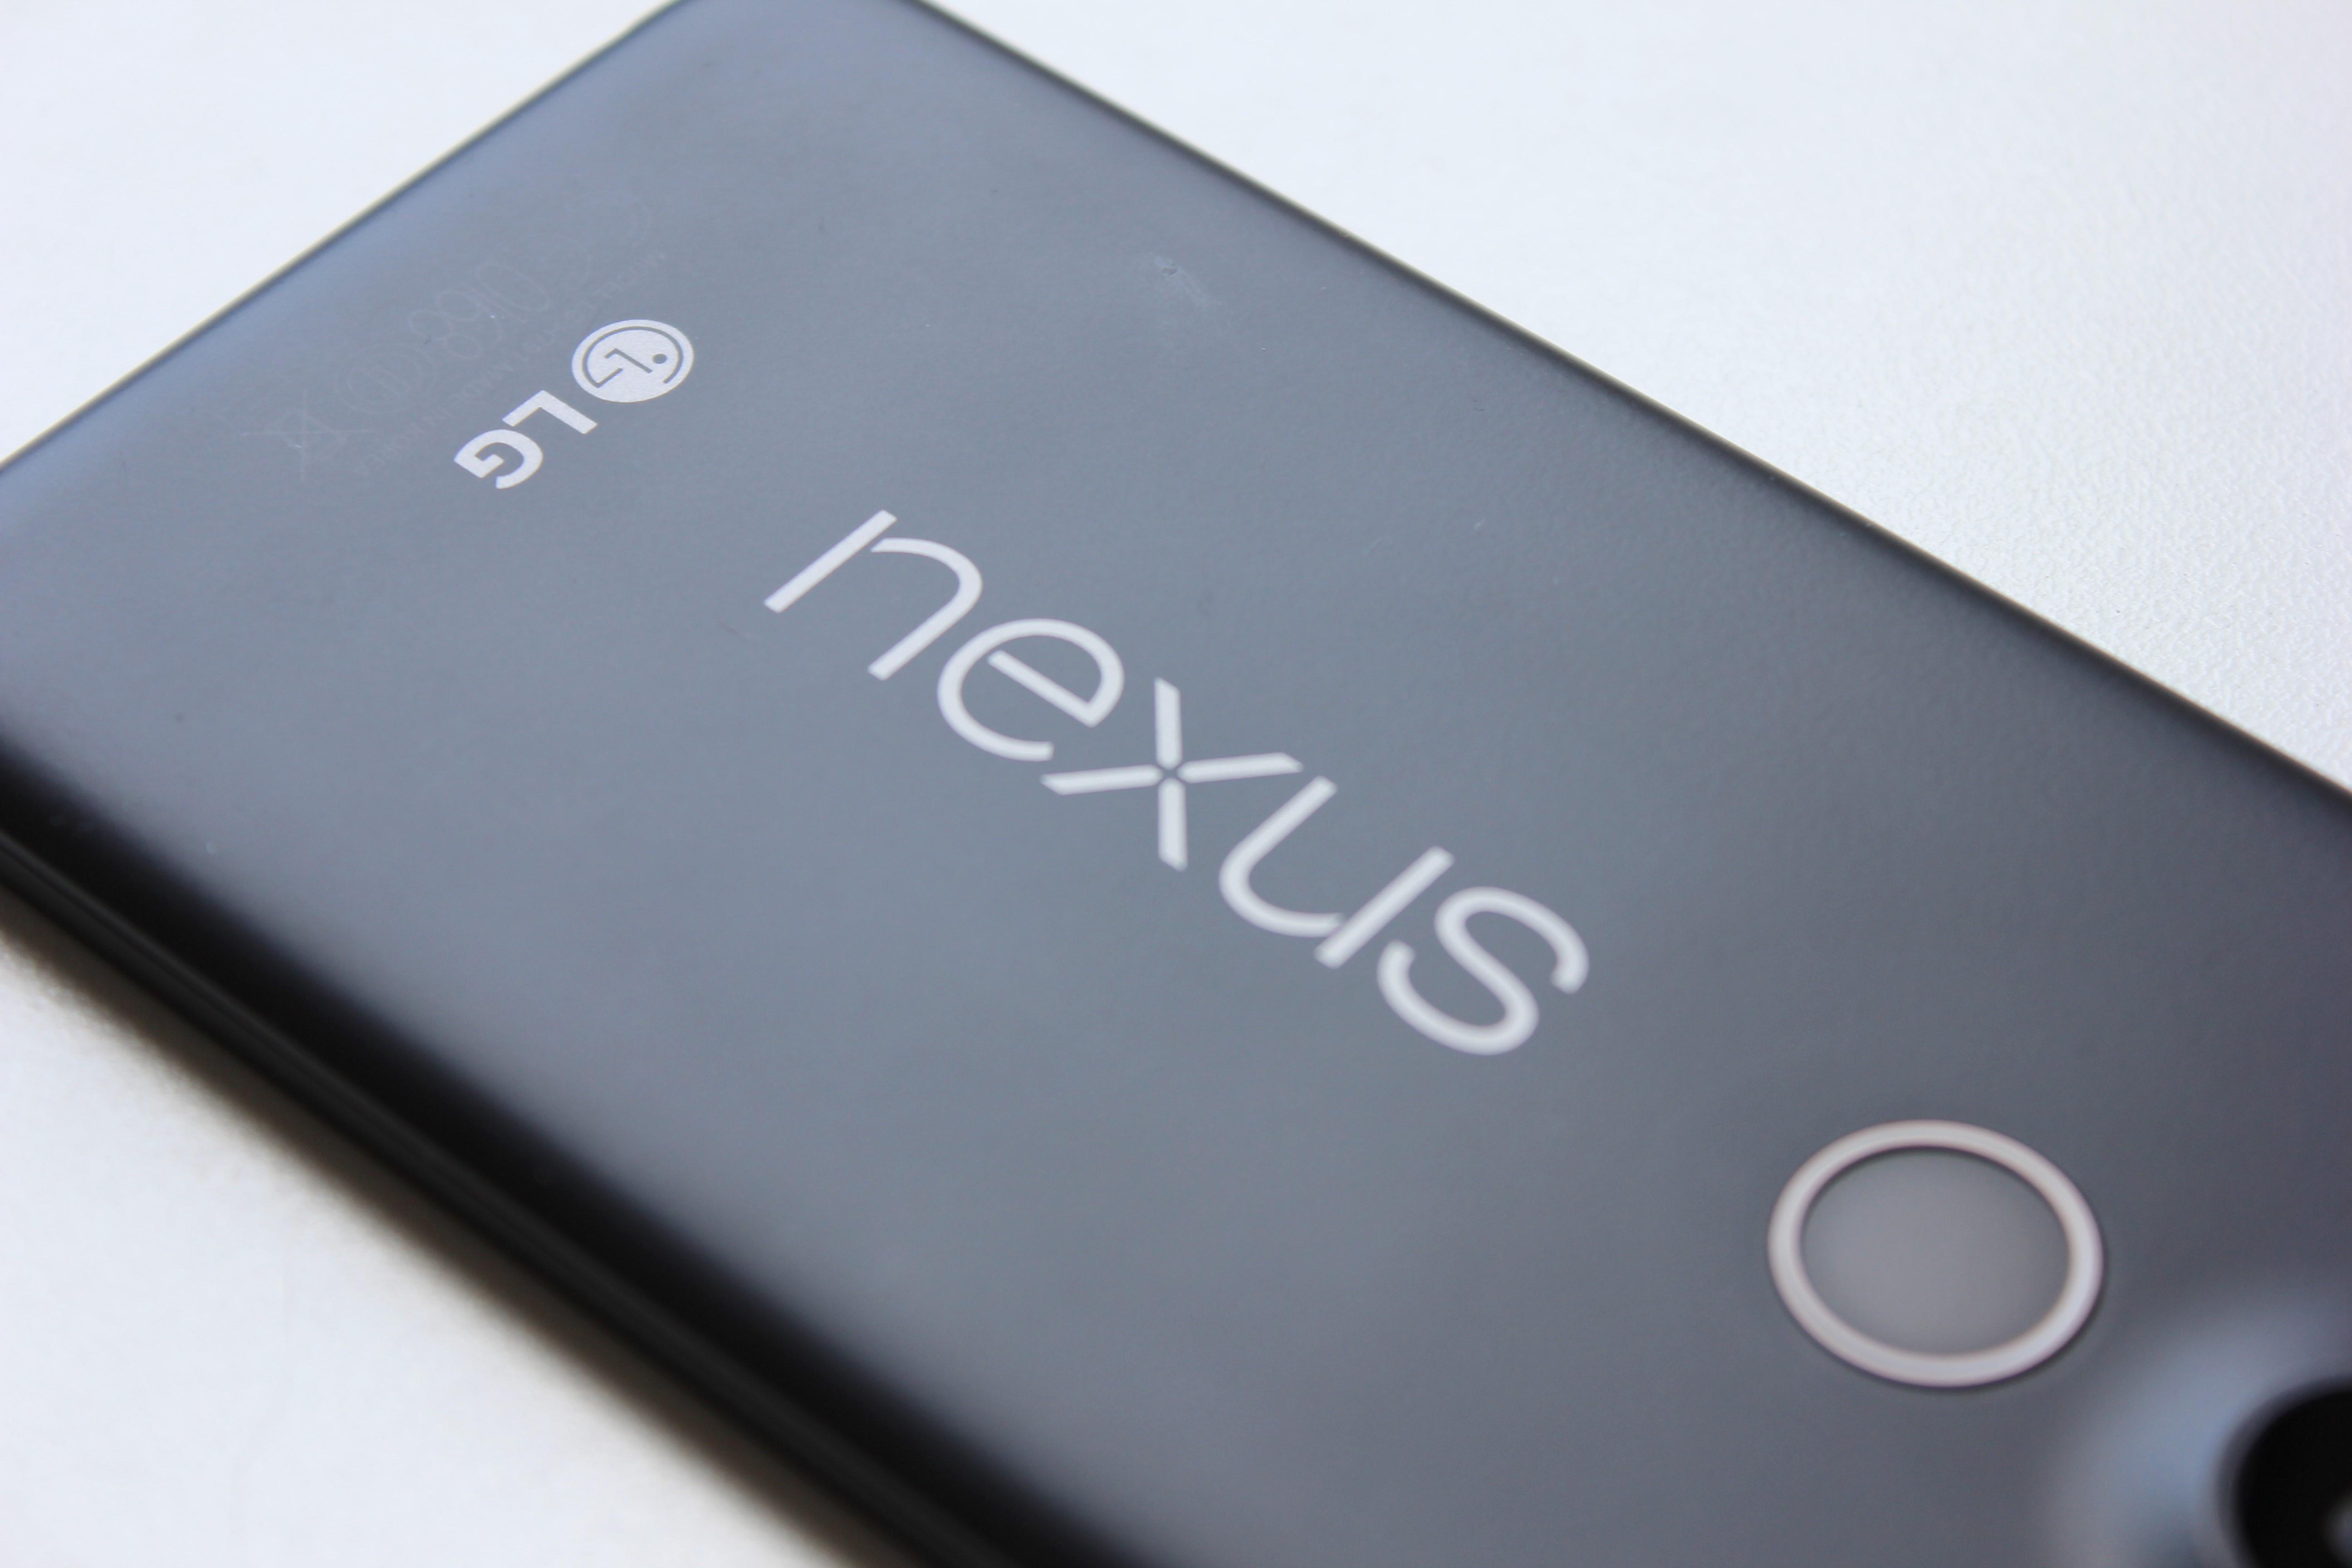 aktauliazacja-androida-nexus-5x